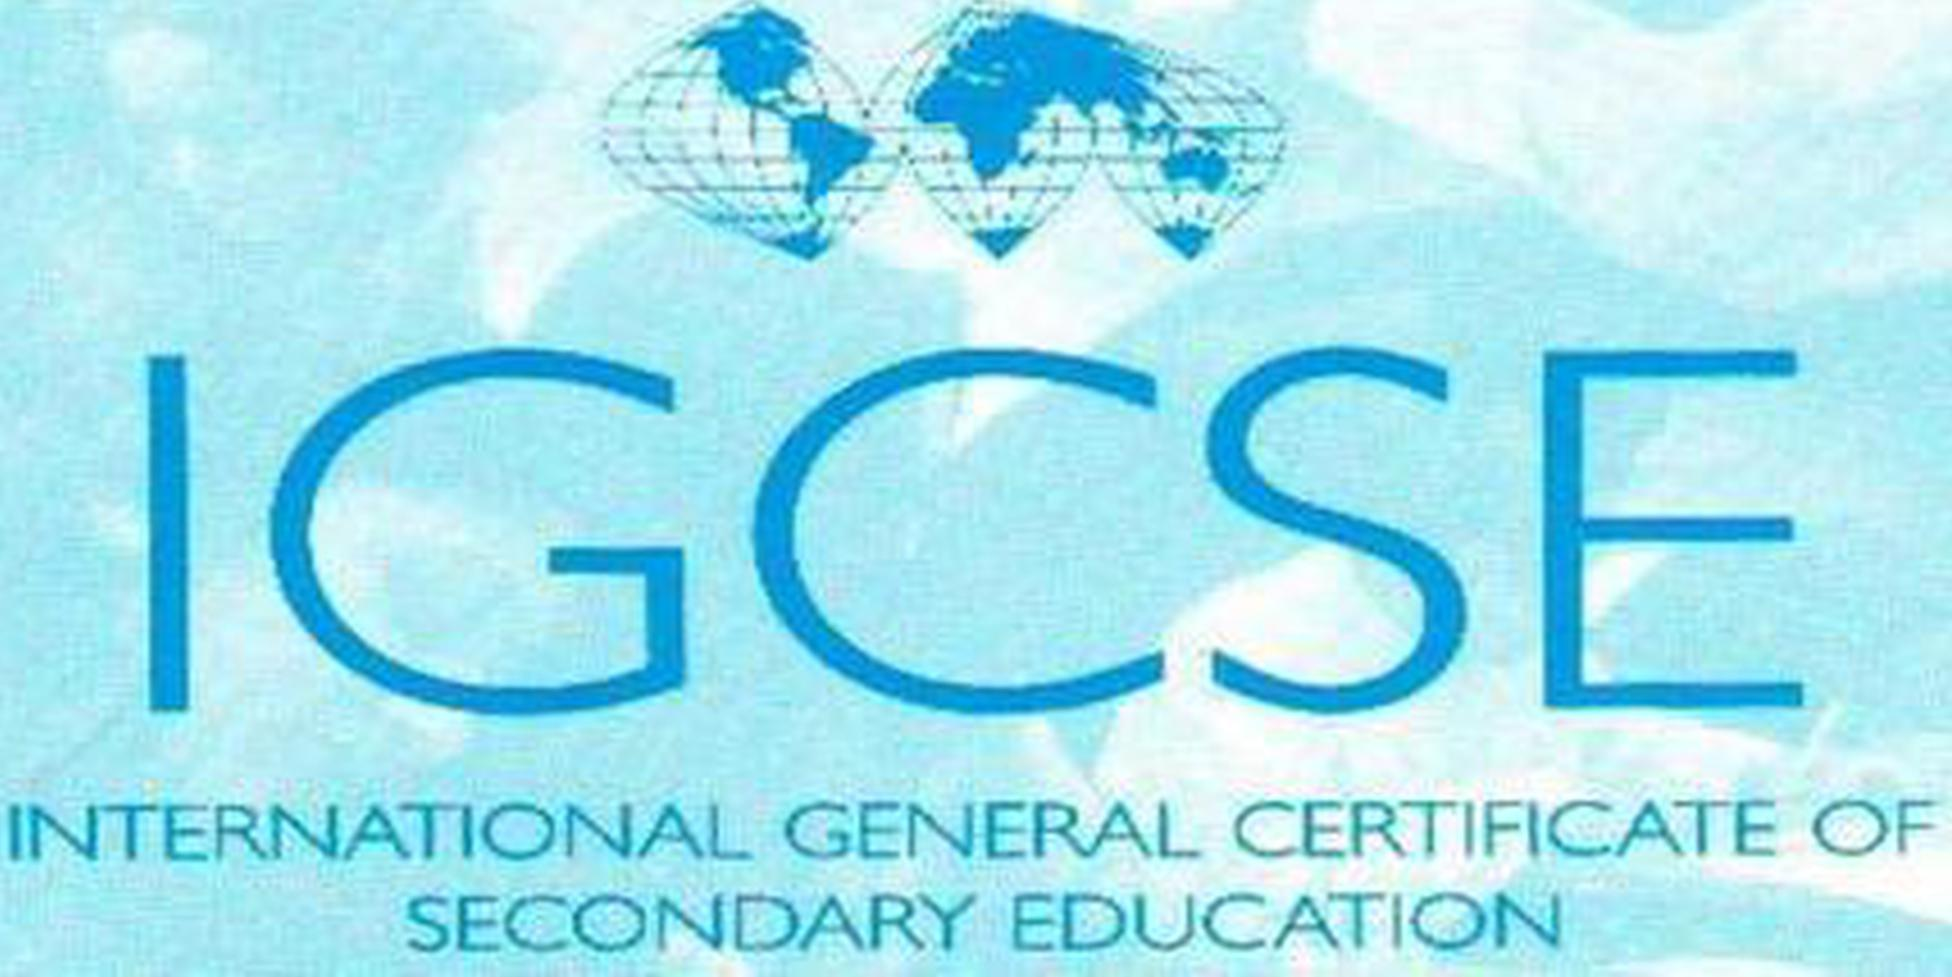 IGCSE课程:辅导考试局课程差异分析